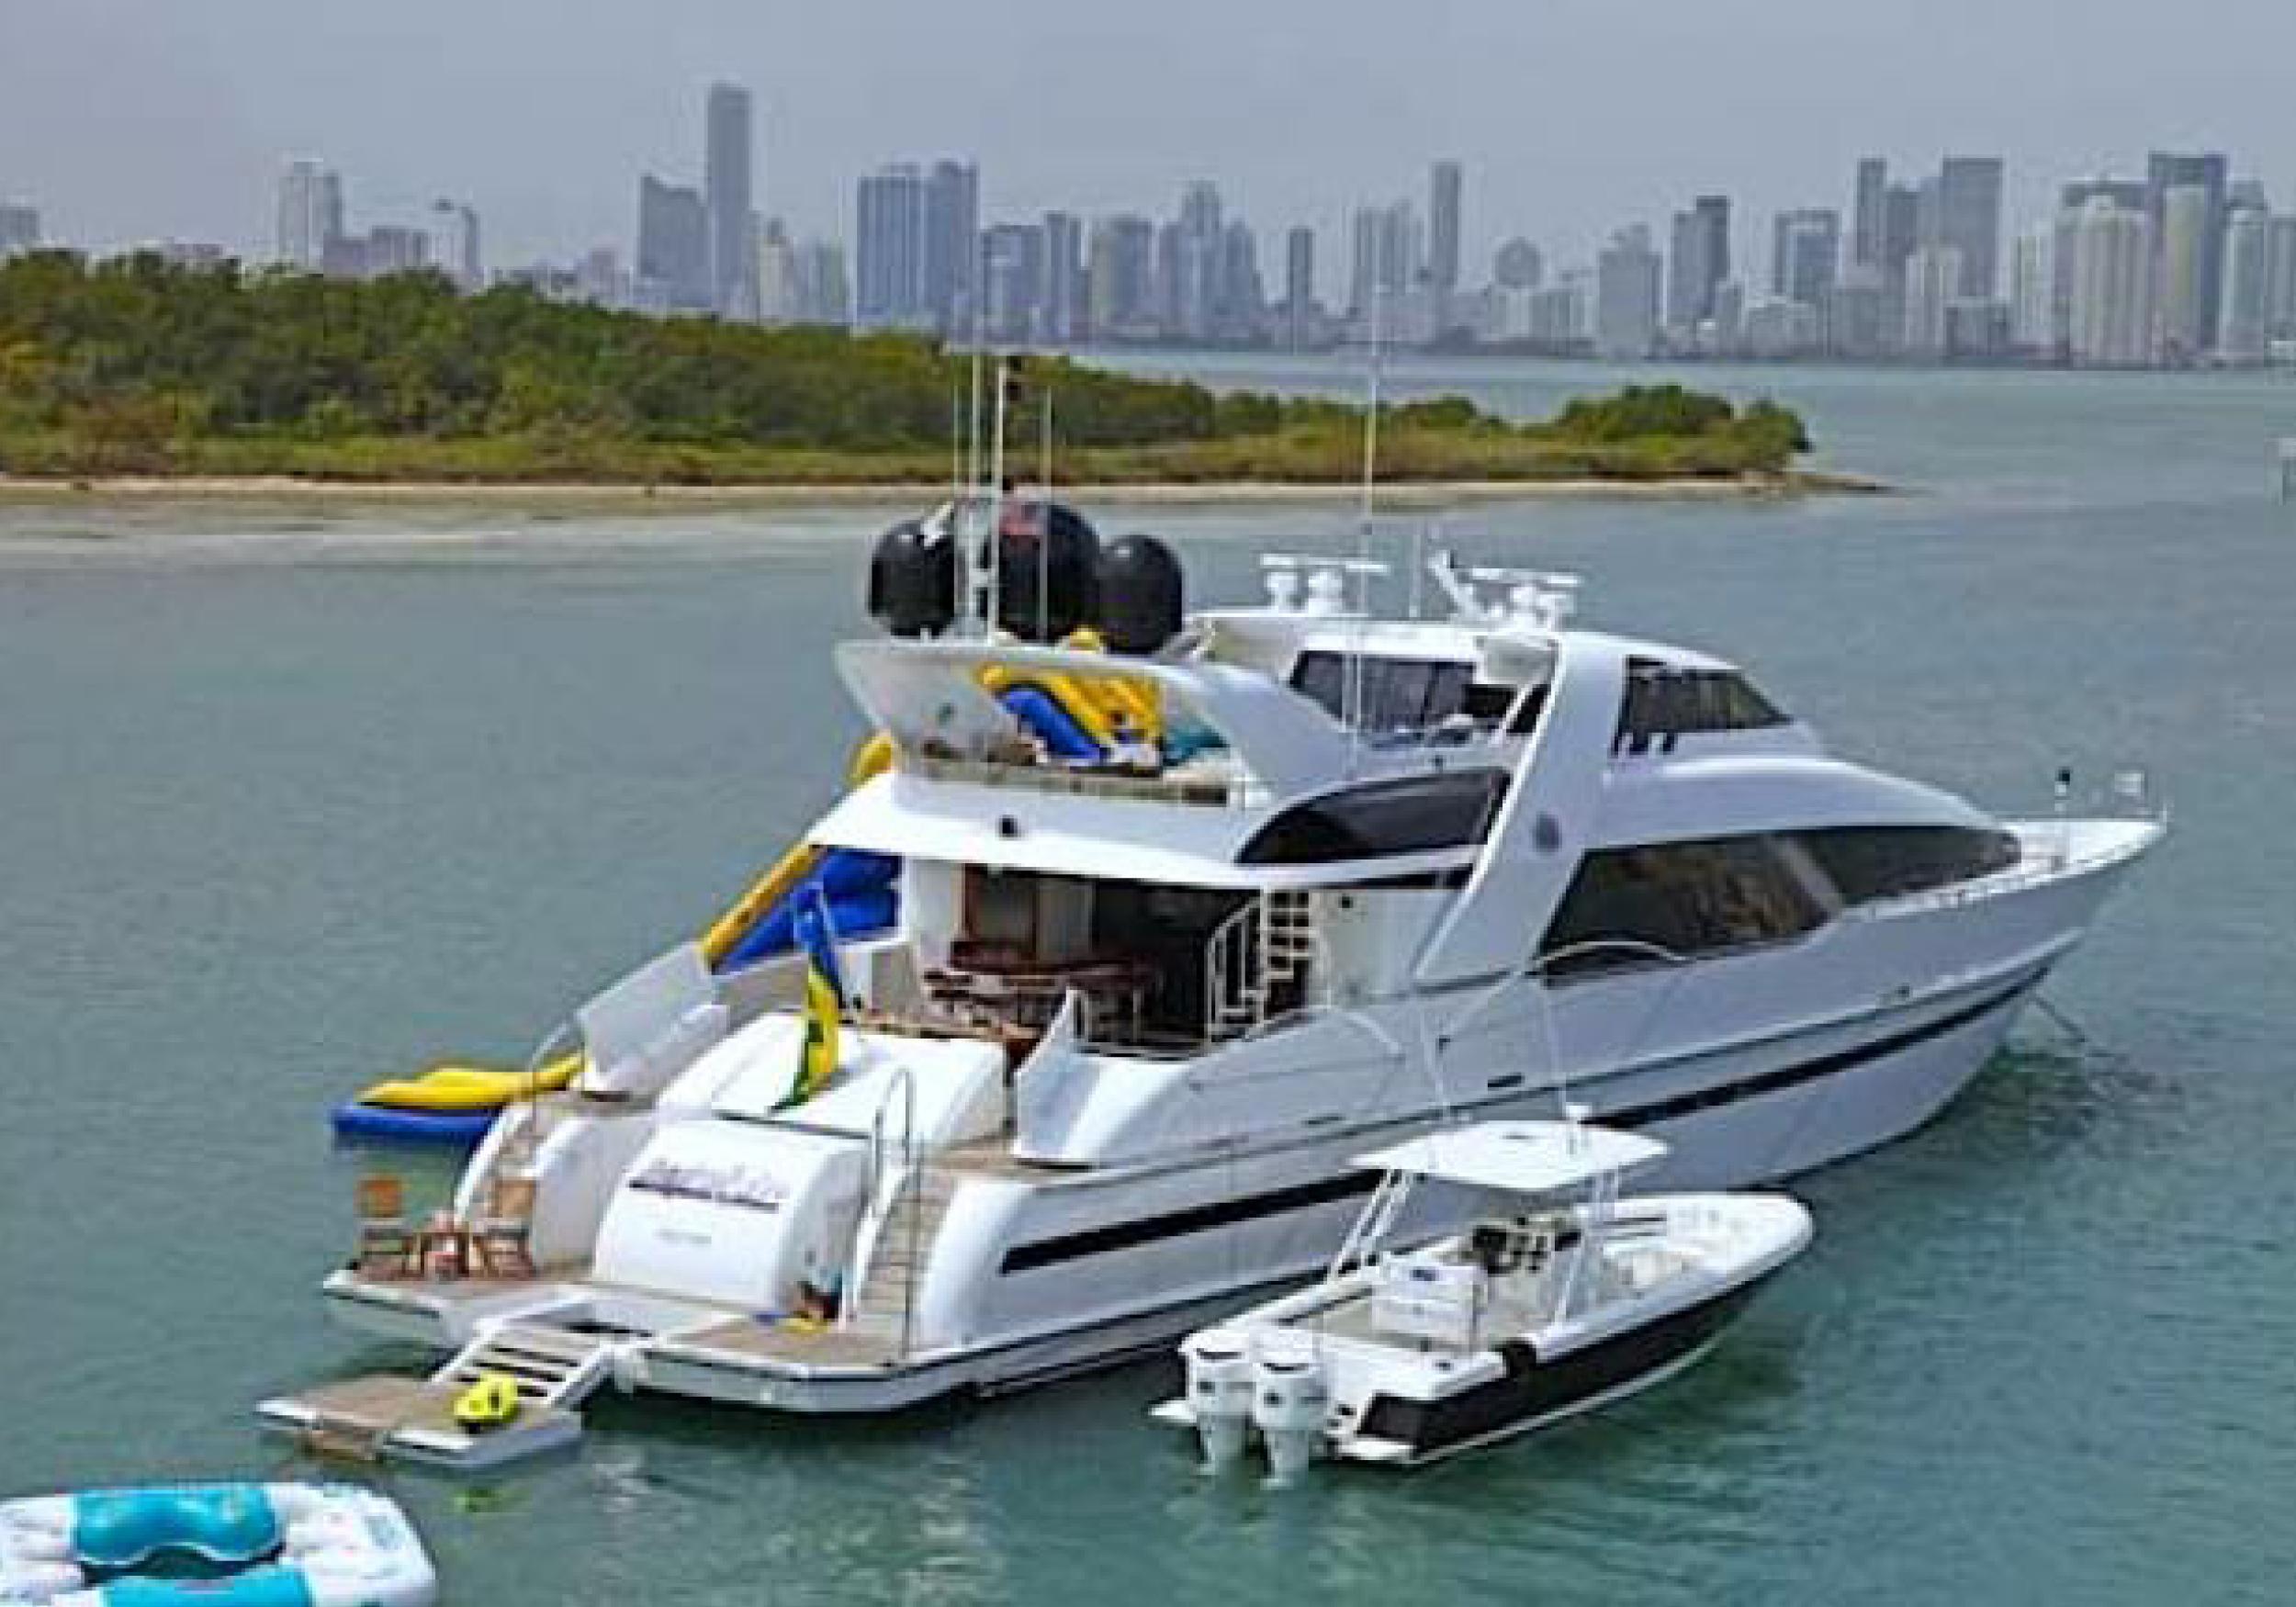 Karen-Lynn-Interior-Design-Yacht-Impulsive-1.jpg